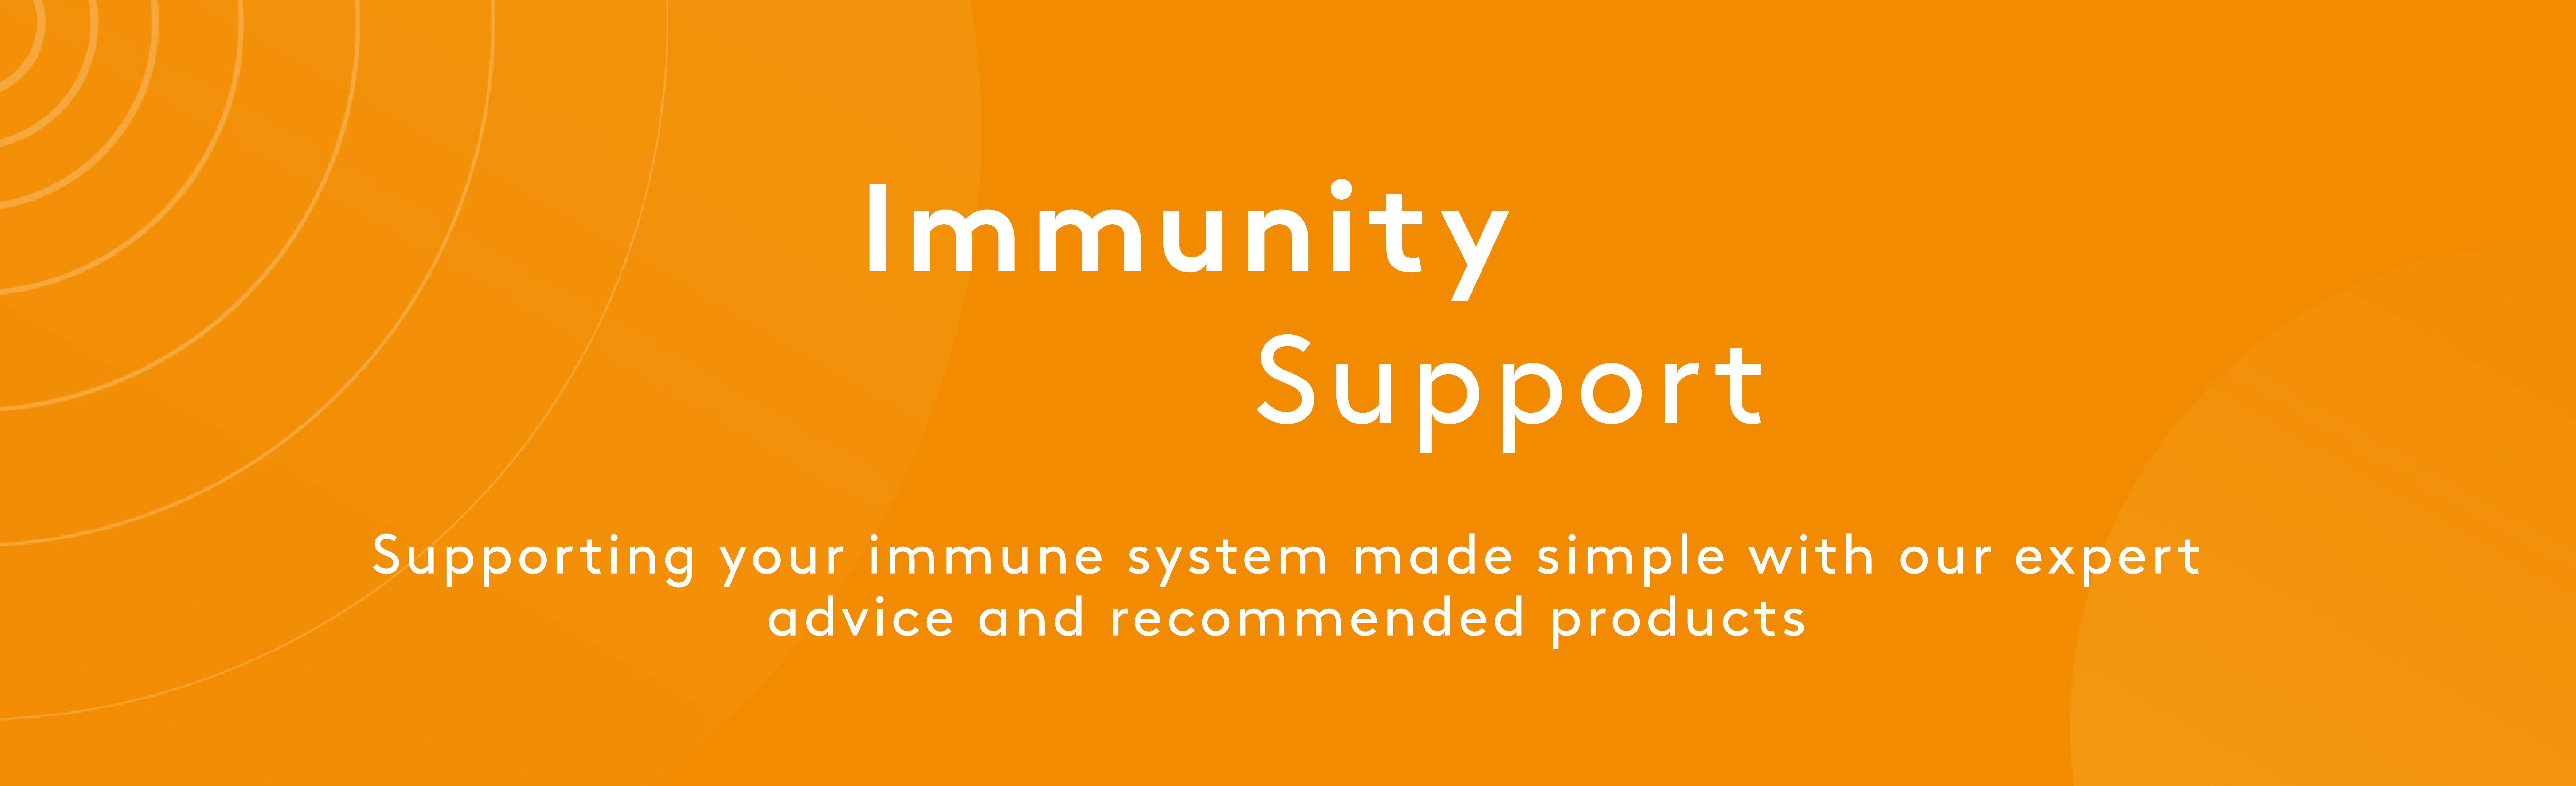 Immunity Support | Myvitamins